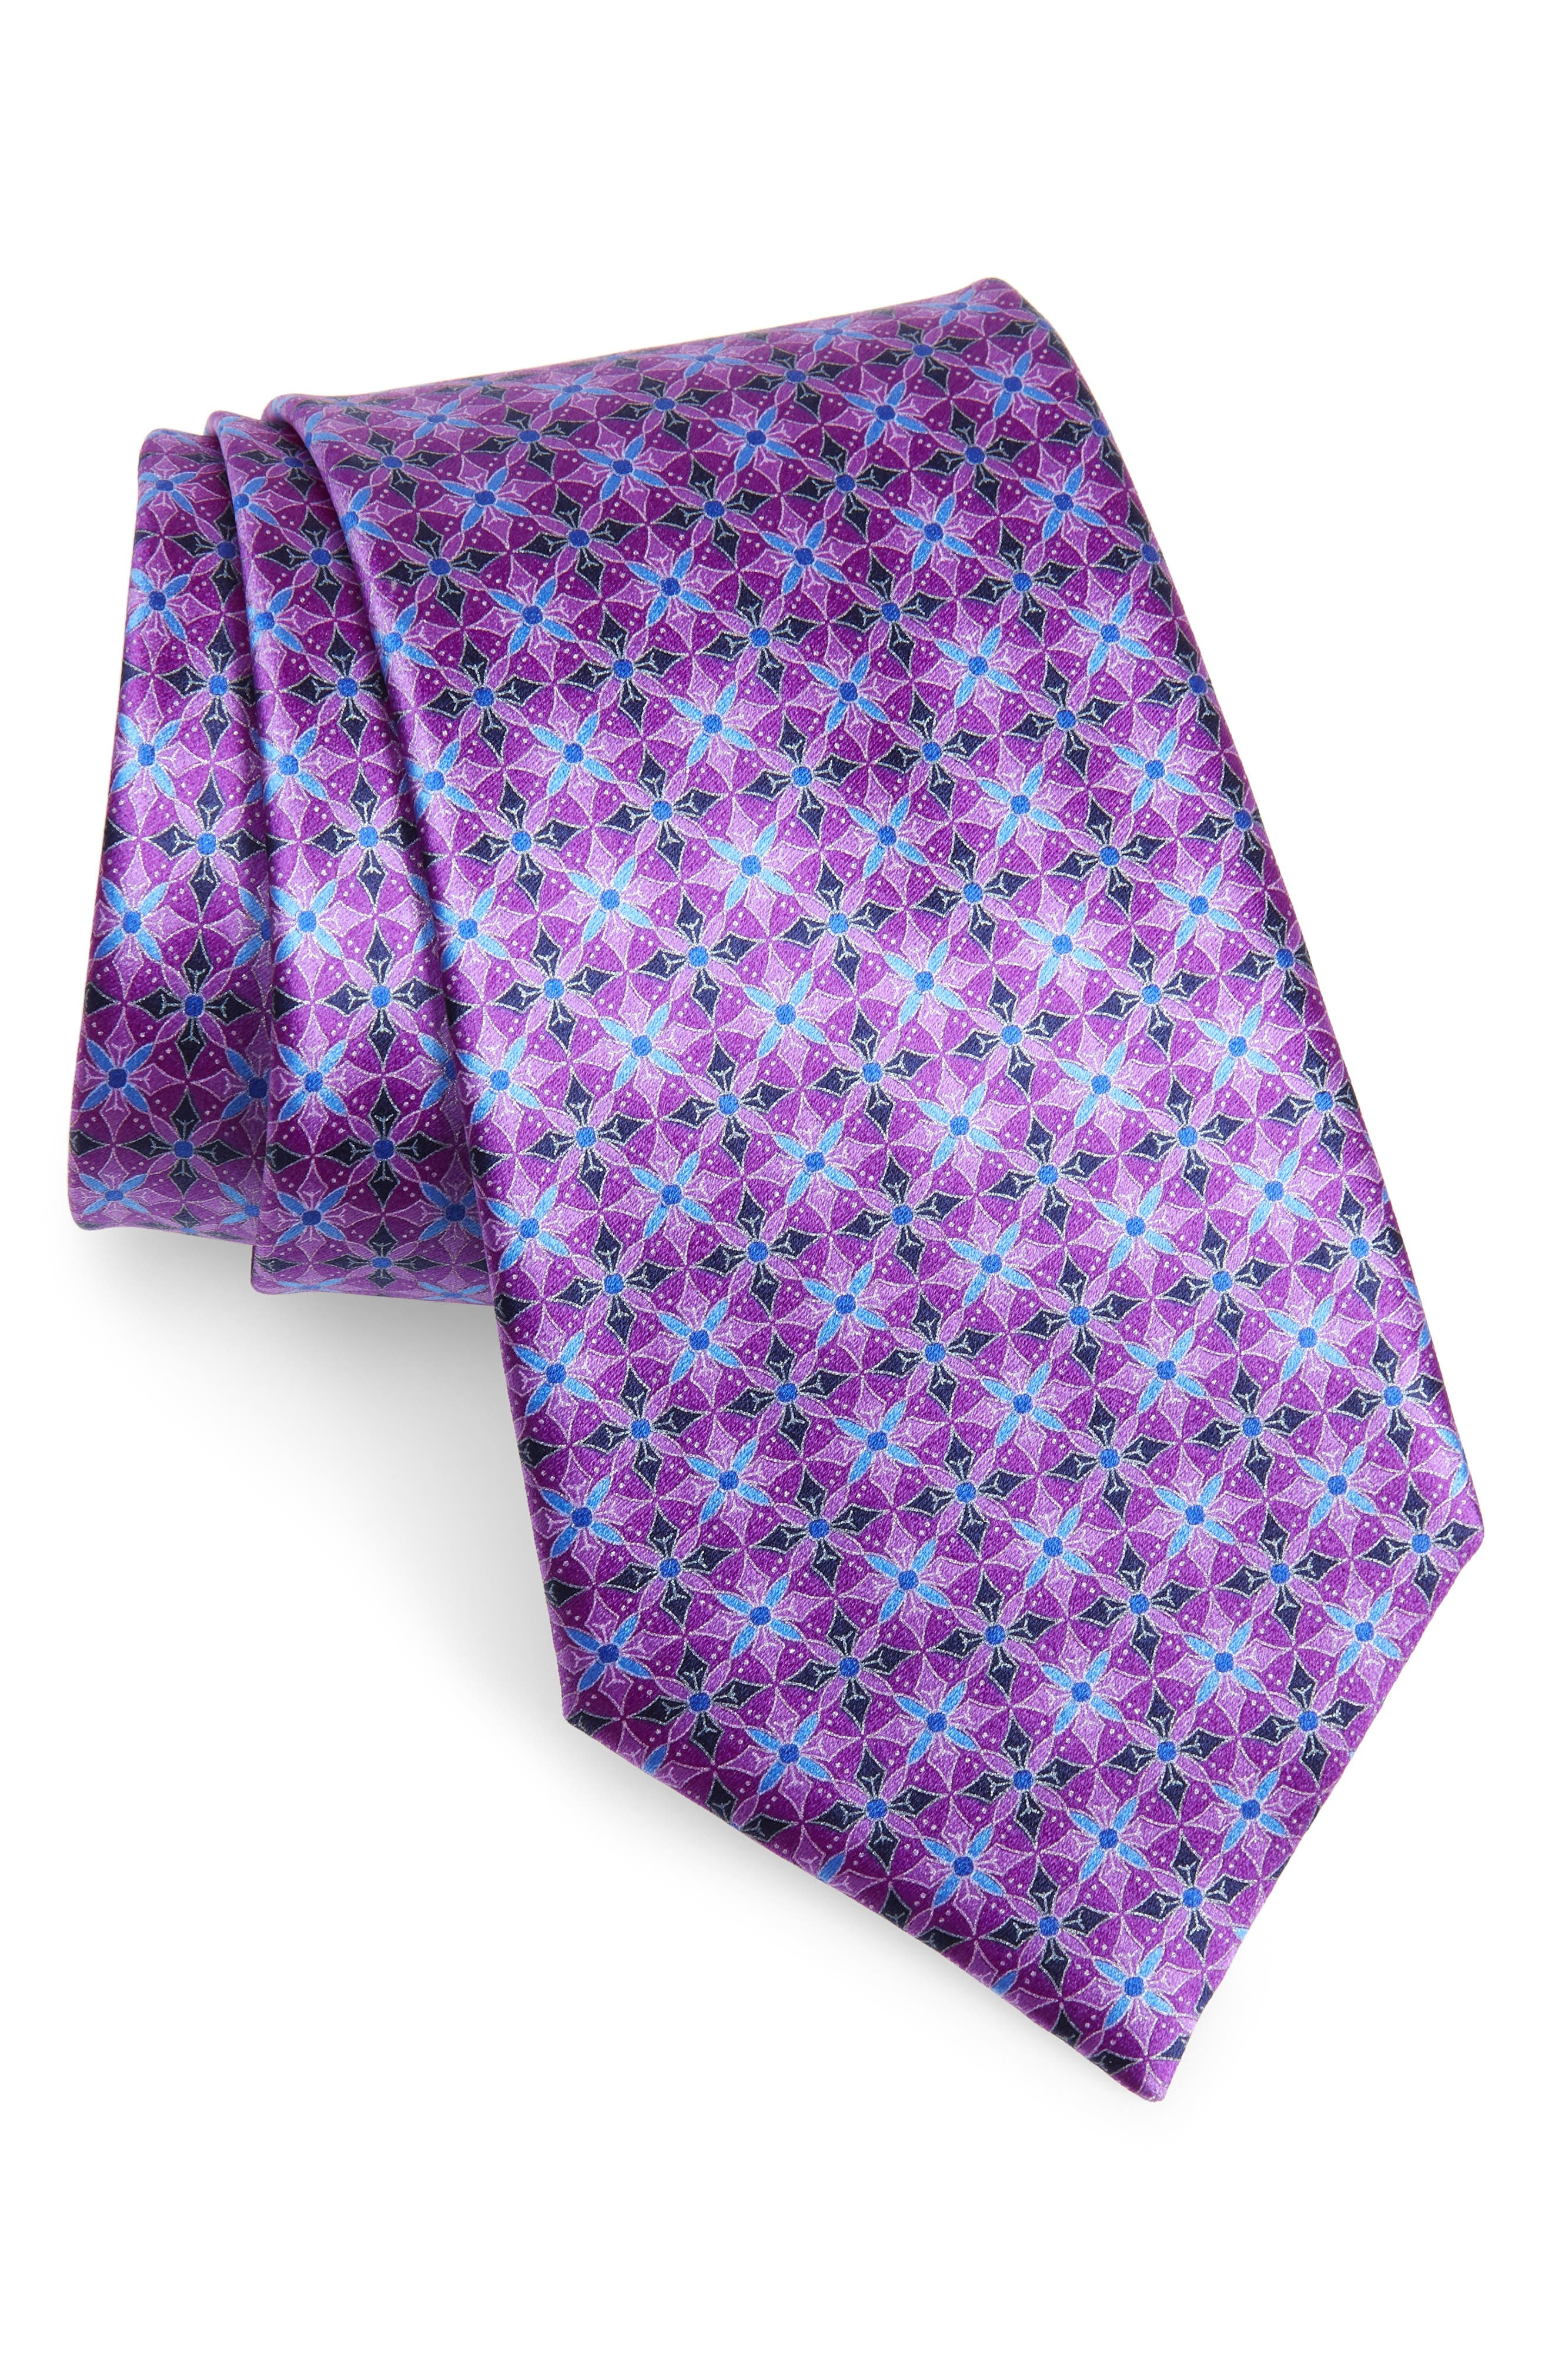 ERMENEGILDO ZEGNA, Geometric Silk Tie, Main thumbnail 1, color, PURPLE